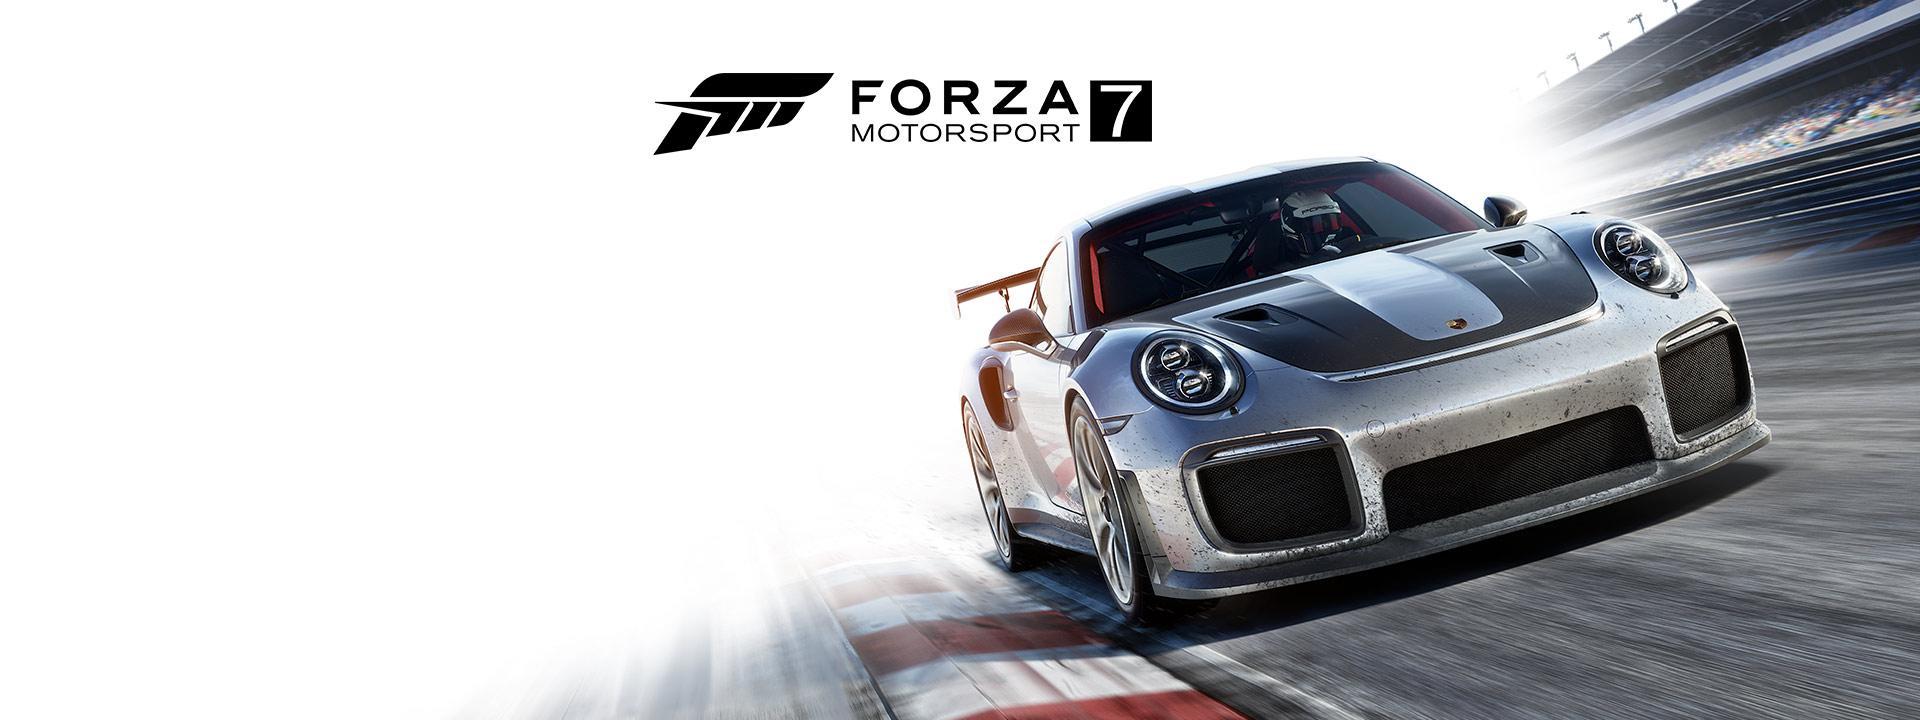 Forza 7 MotorSport